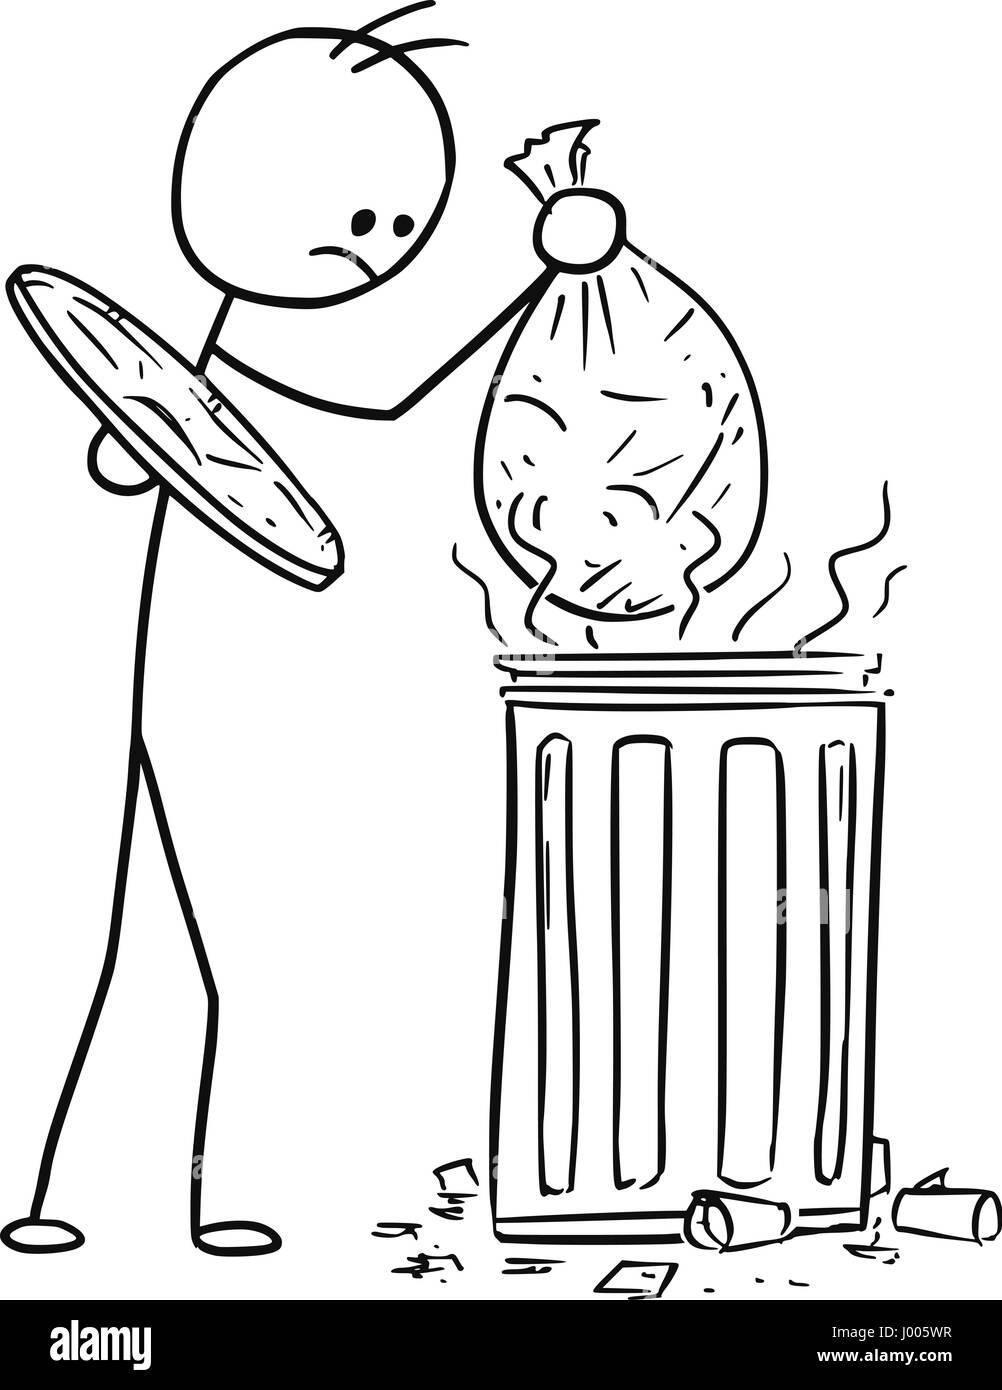 Cartoon Vector Stickman Men Is Throwing Putting The Bag